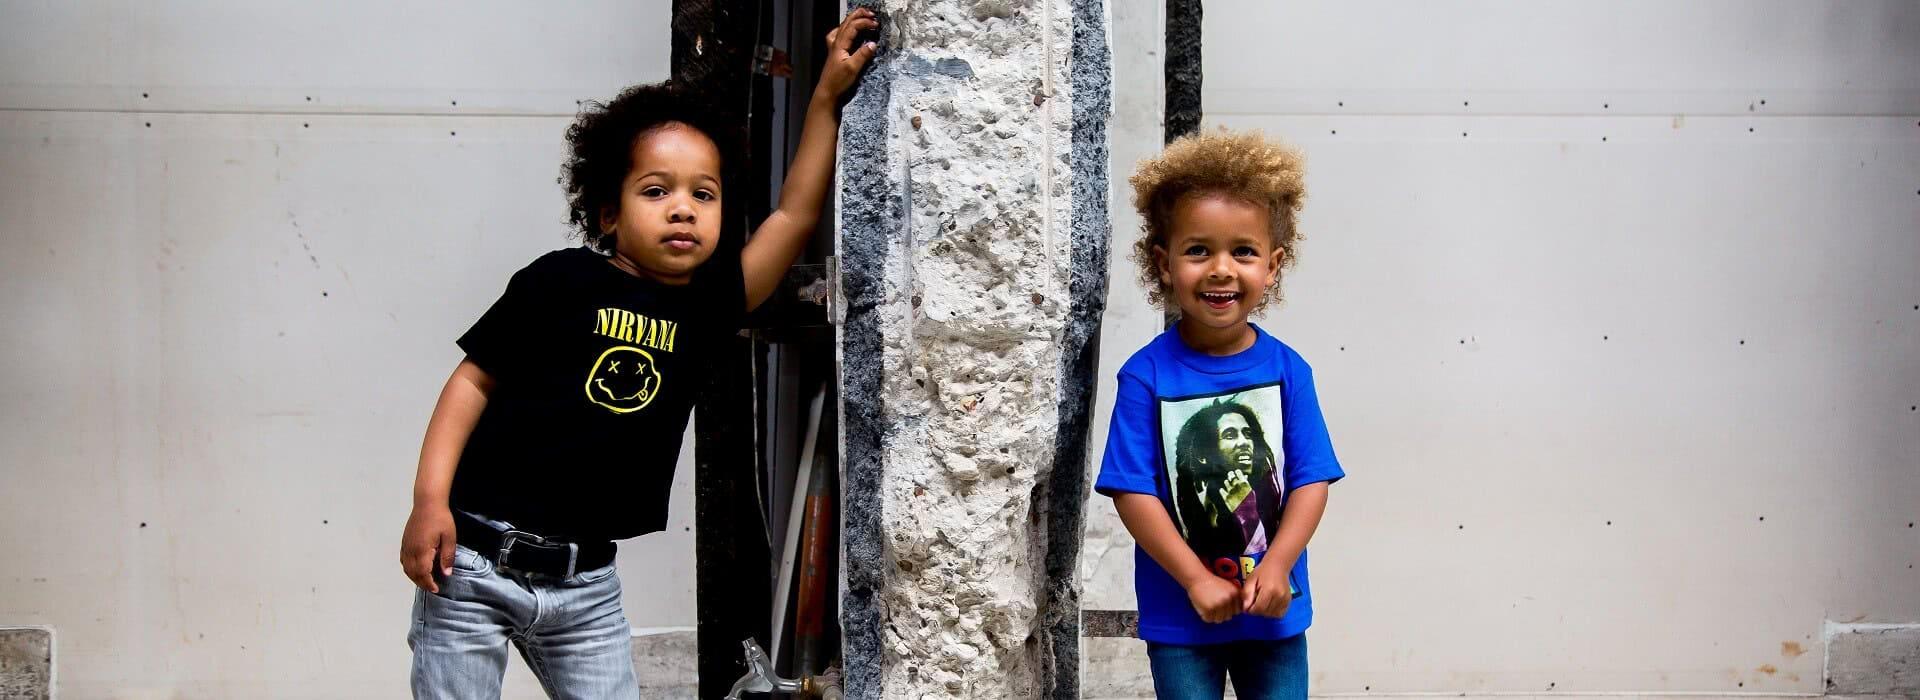 Kids rock kleding